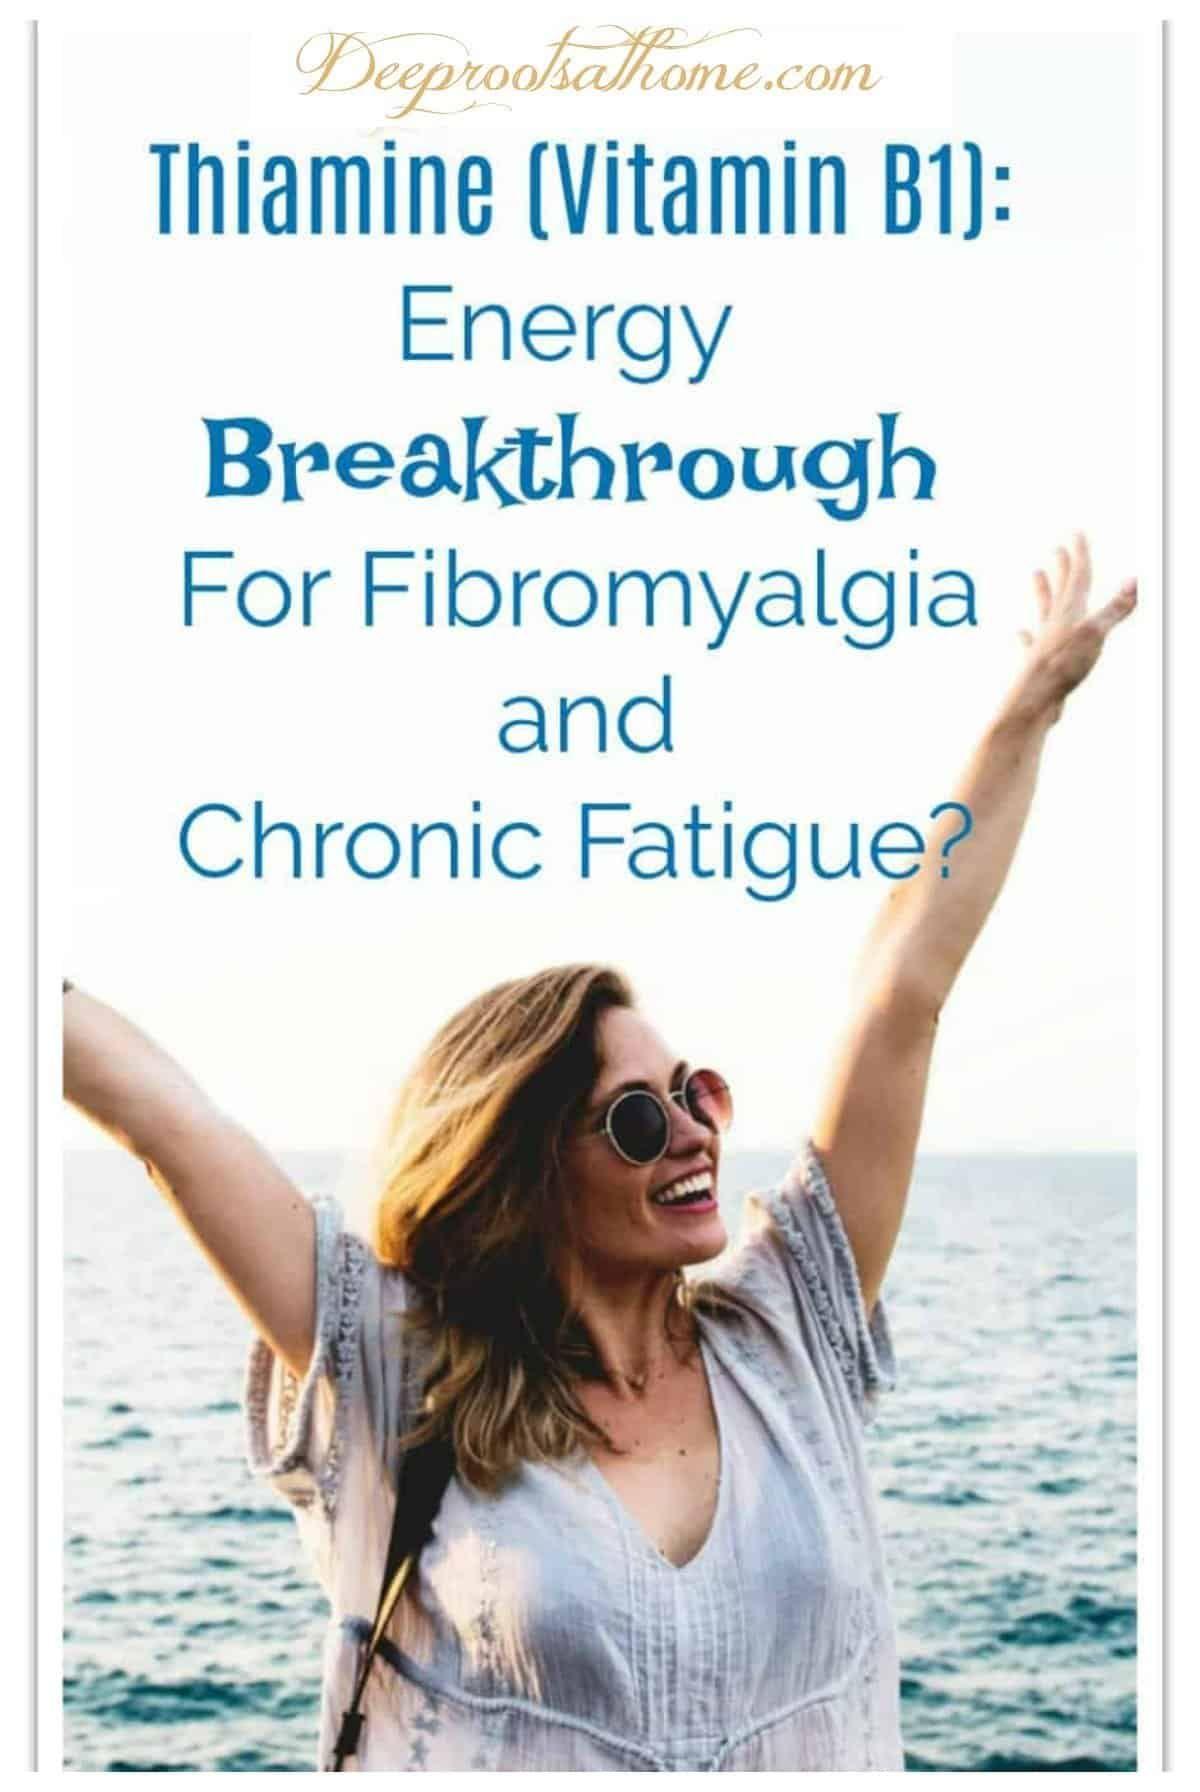 Thiamine (Vit B1): Energy Discovery For Fibromyalgia & Chronic Fatigue. #healthy #health #ideas #tip...